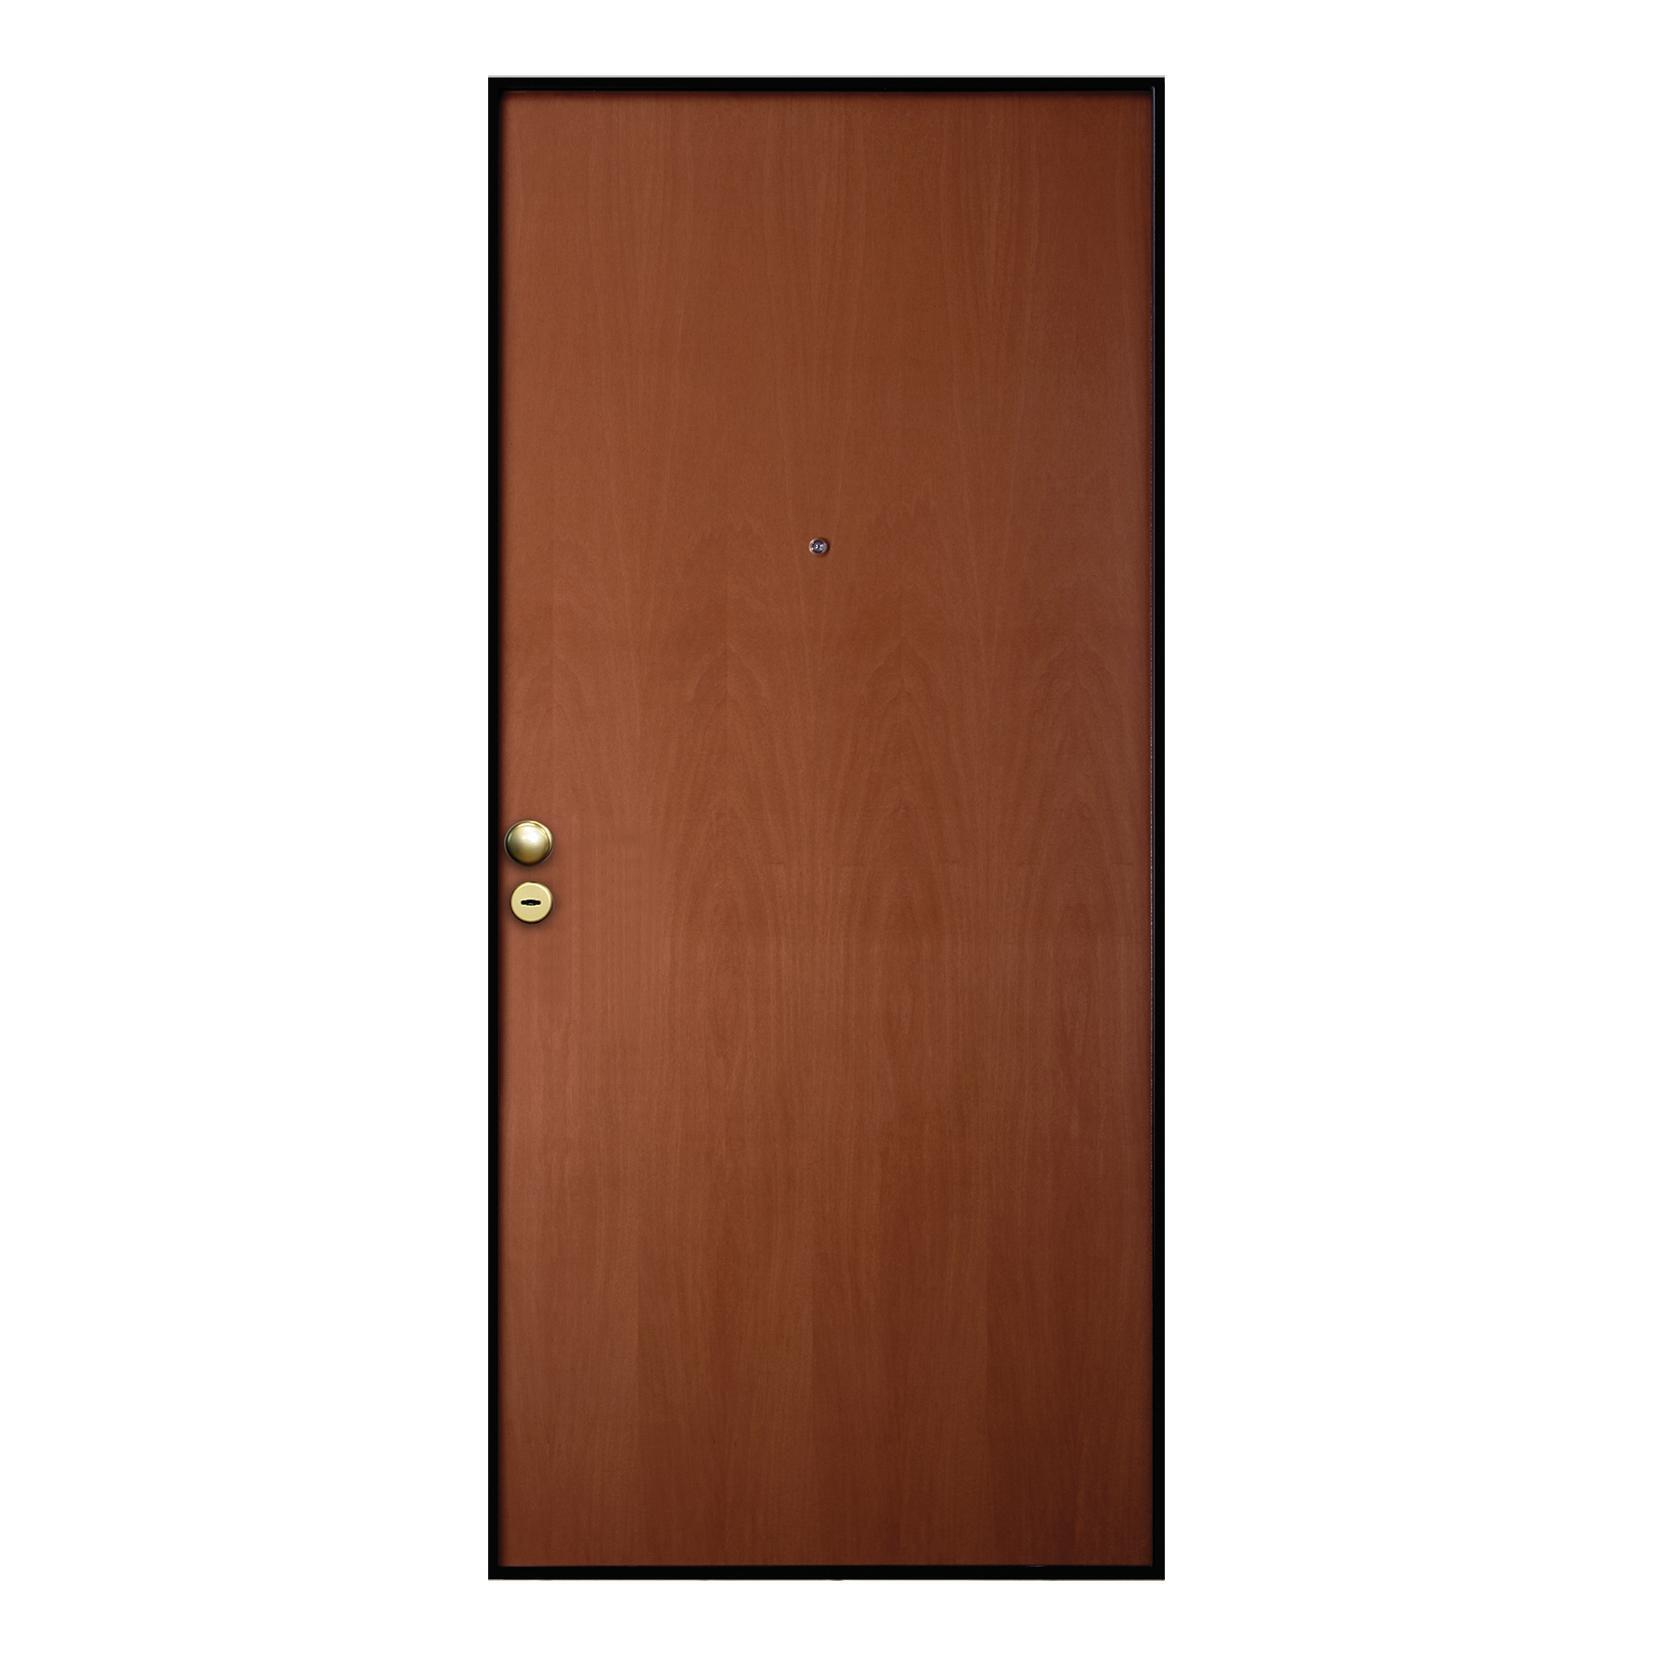 Porta blindata Good noce L 90 x H 210 cm destra - 3